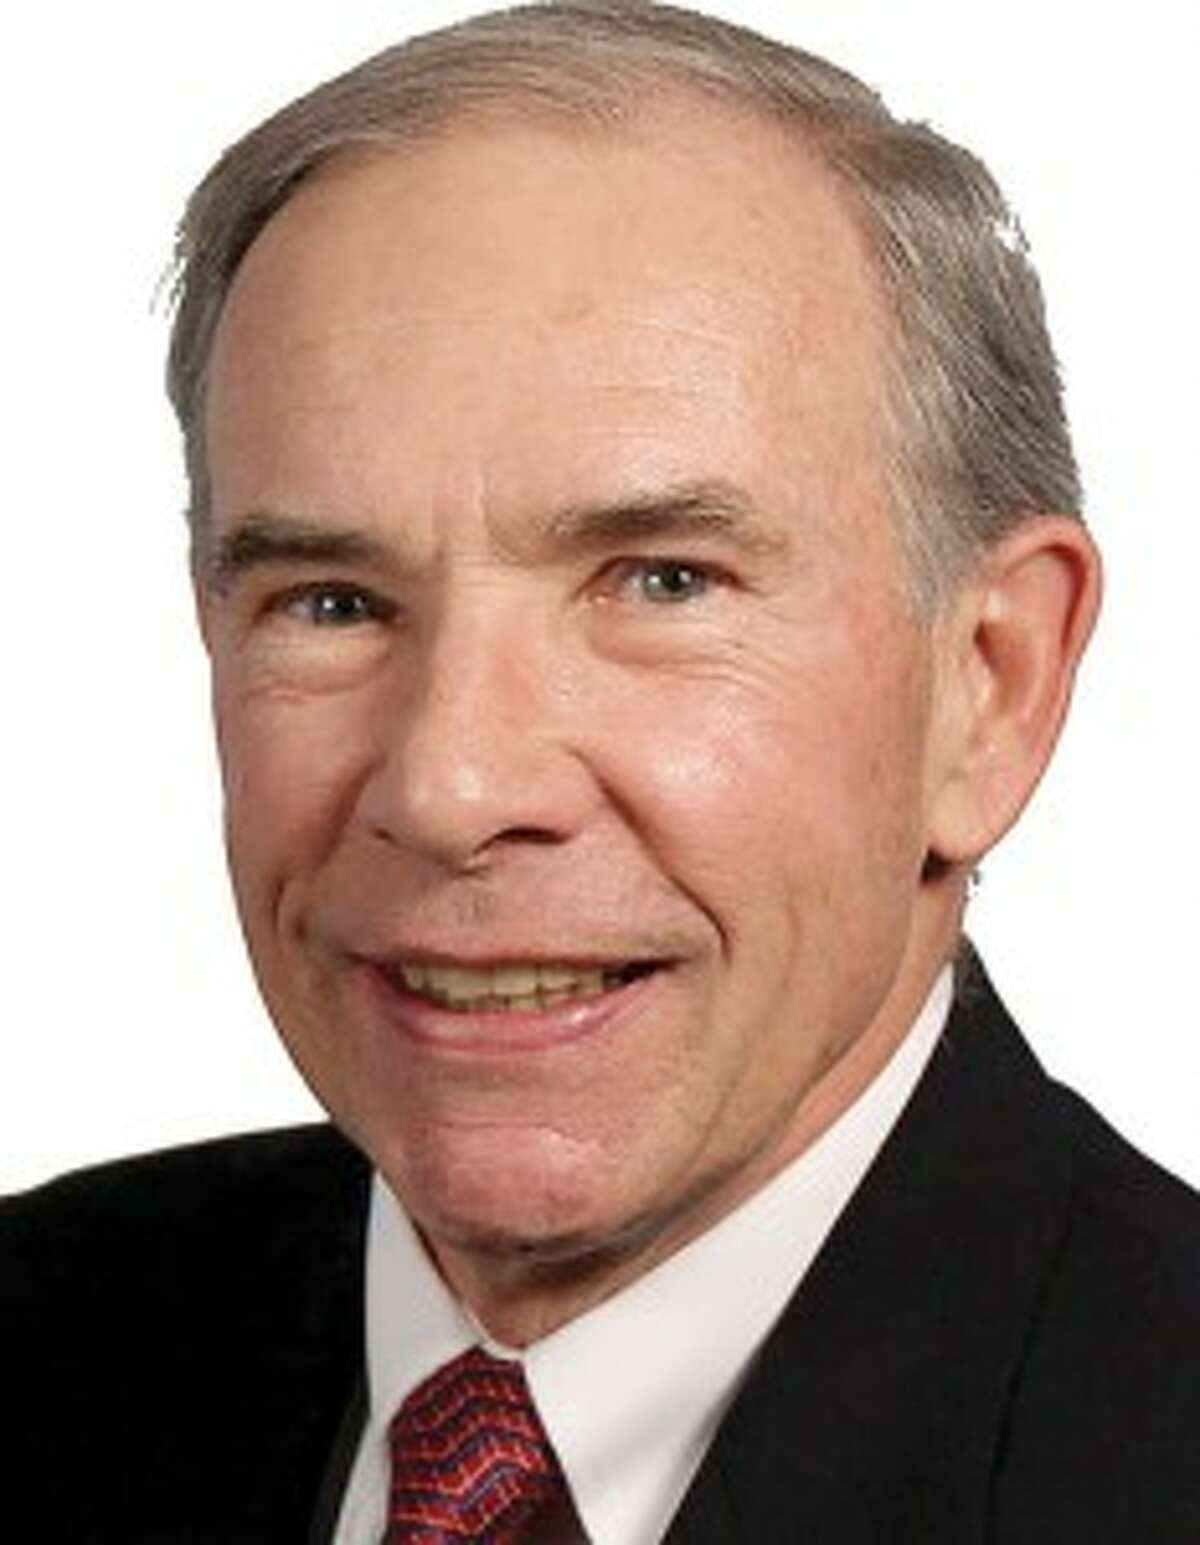 Rep. Phil Potvin, R-Cadillac